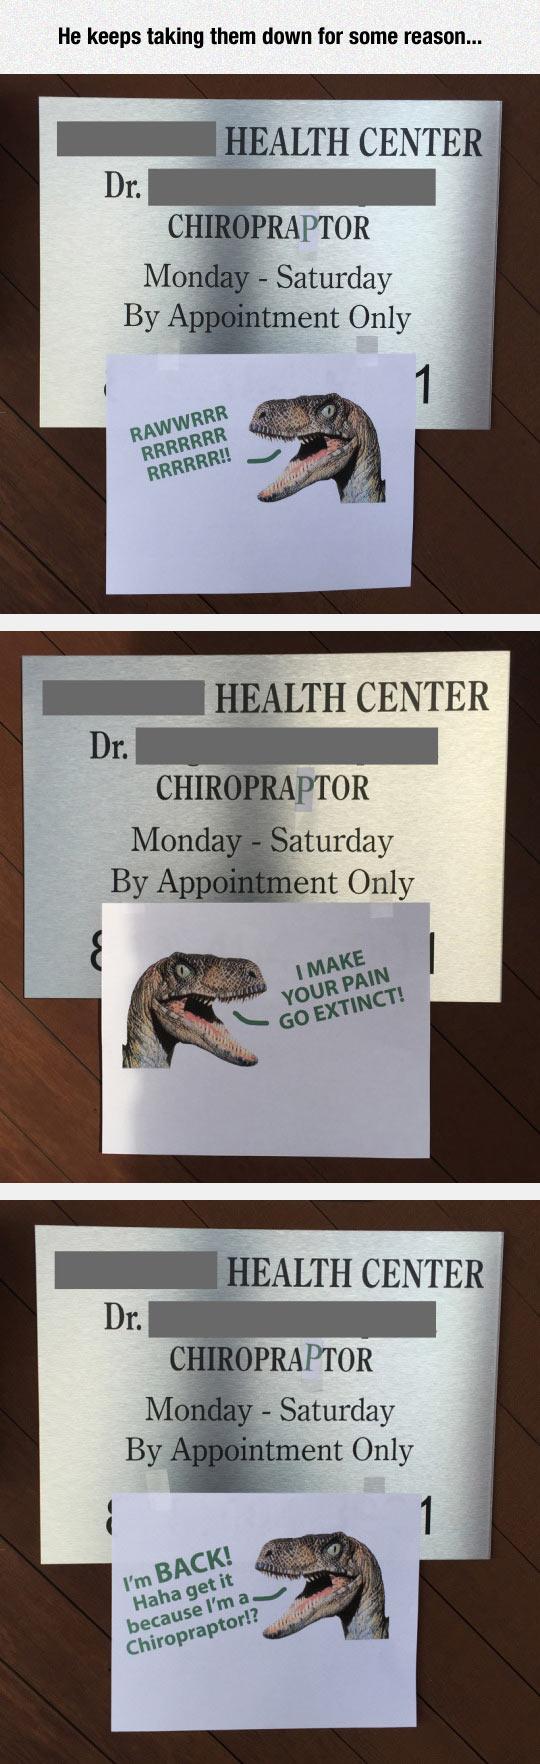 cool-health-center-plate-prank-dinosaur